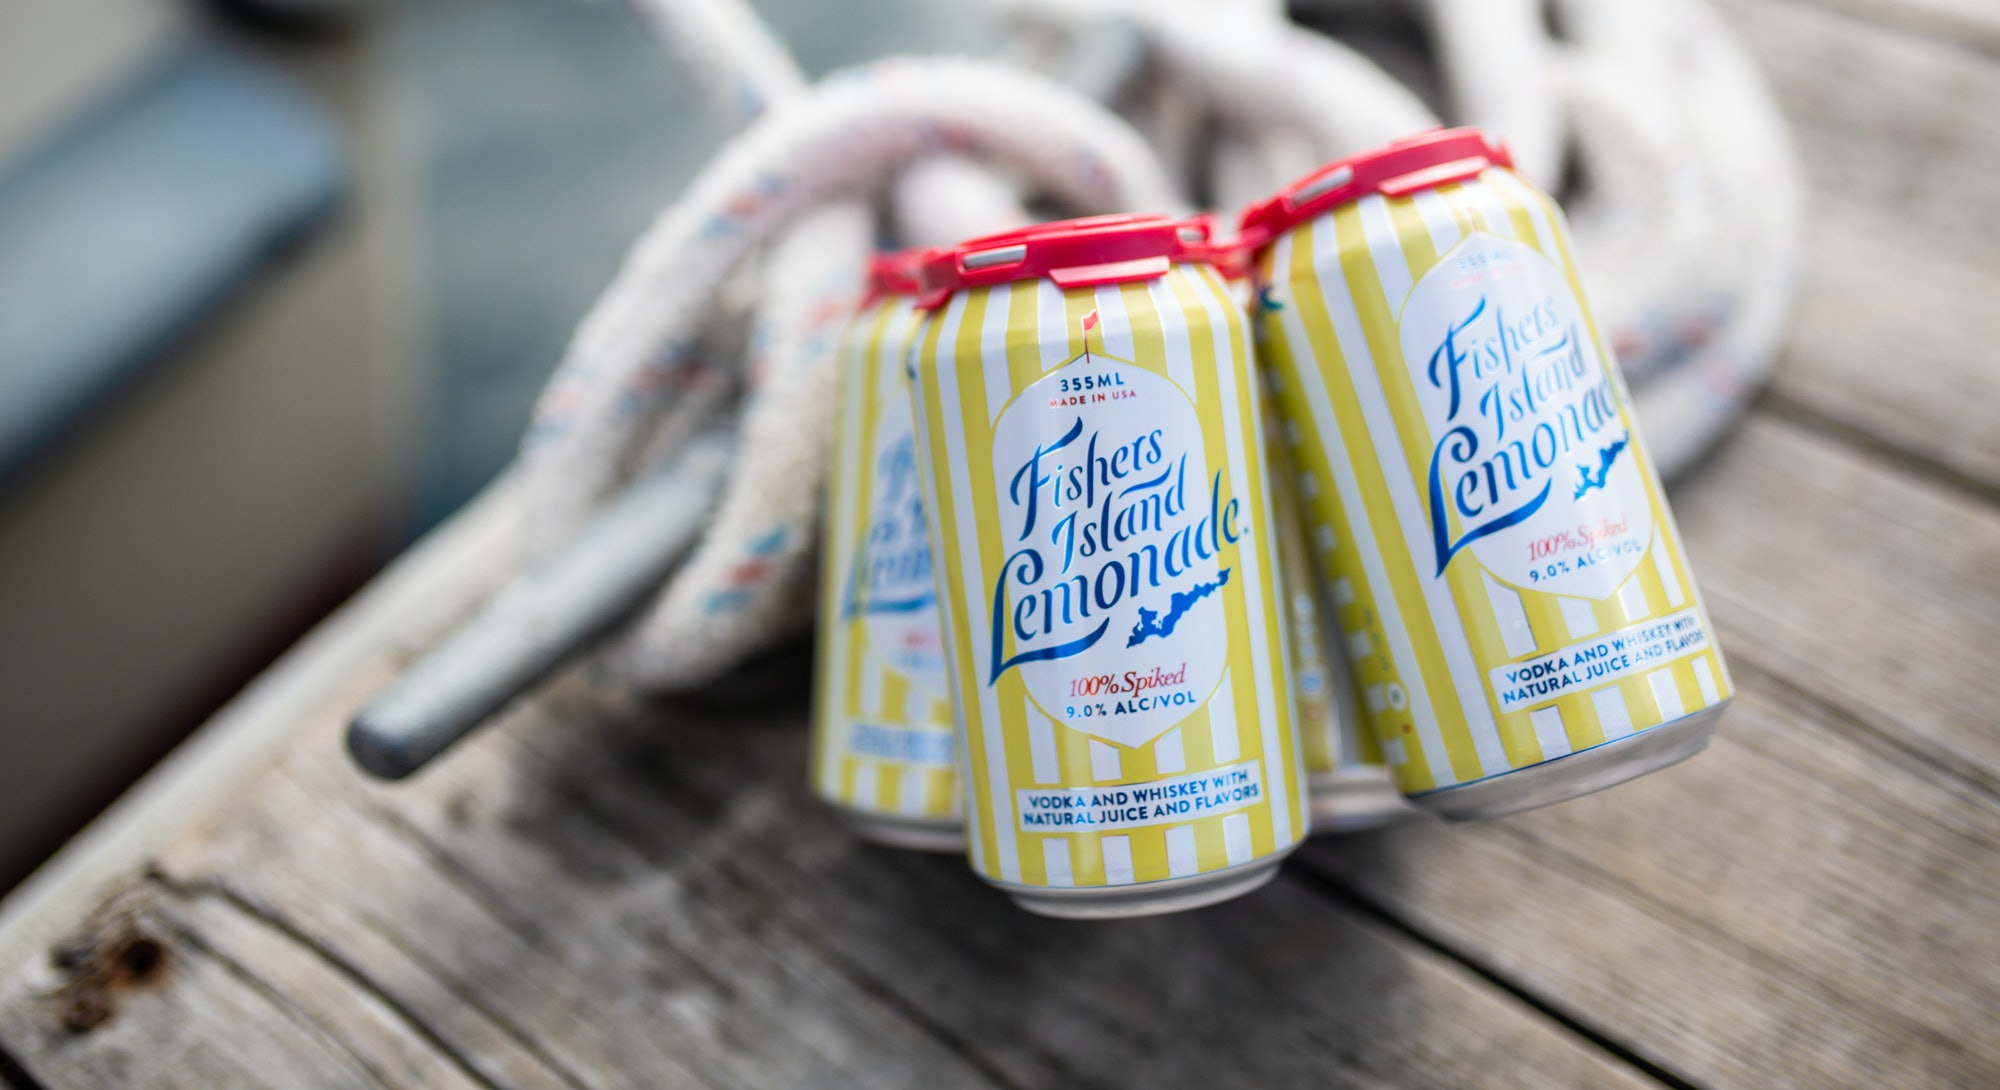 Fishers Island Lemonade is an award-winning spiked lemonade.